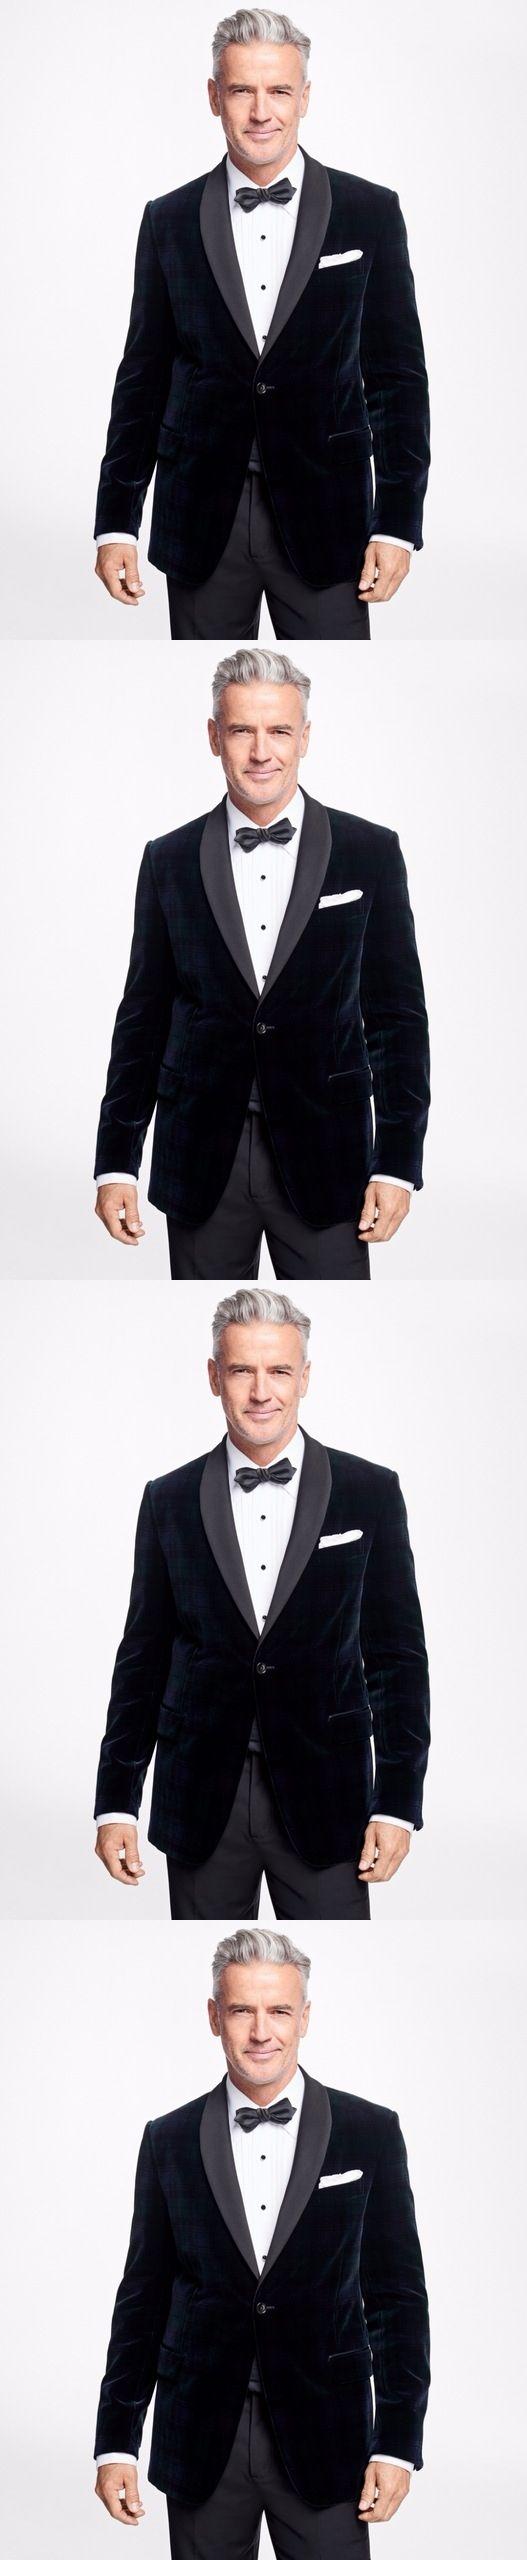 2017 Navy Blue Velvet Suits Jacket With Charcoal Pants Bespoke Shawl Lapel Men's Party Tuxedo Fashion Men Vestido (Jacket+Pants)